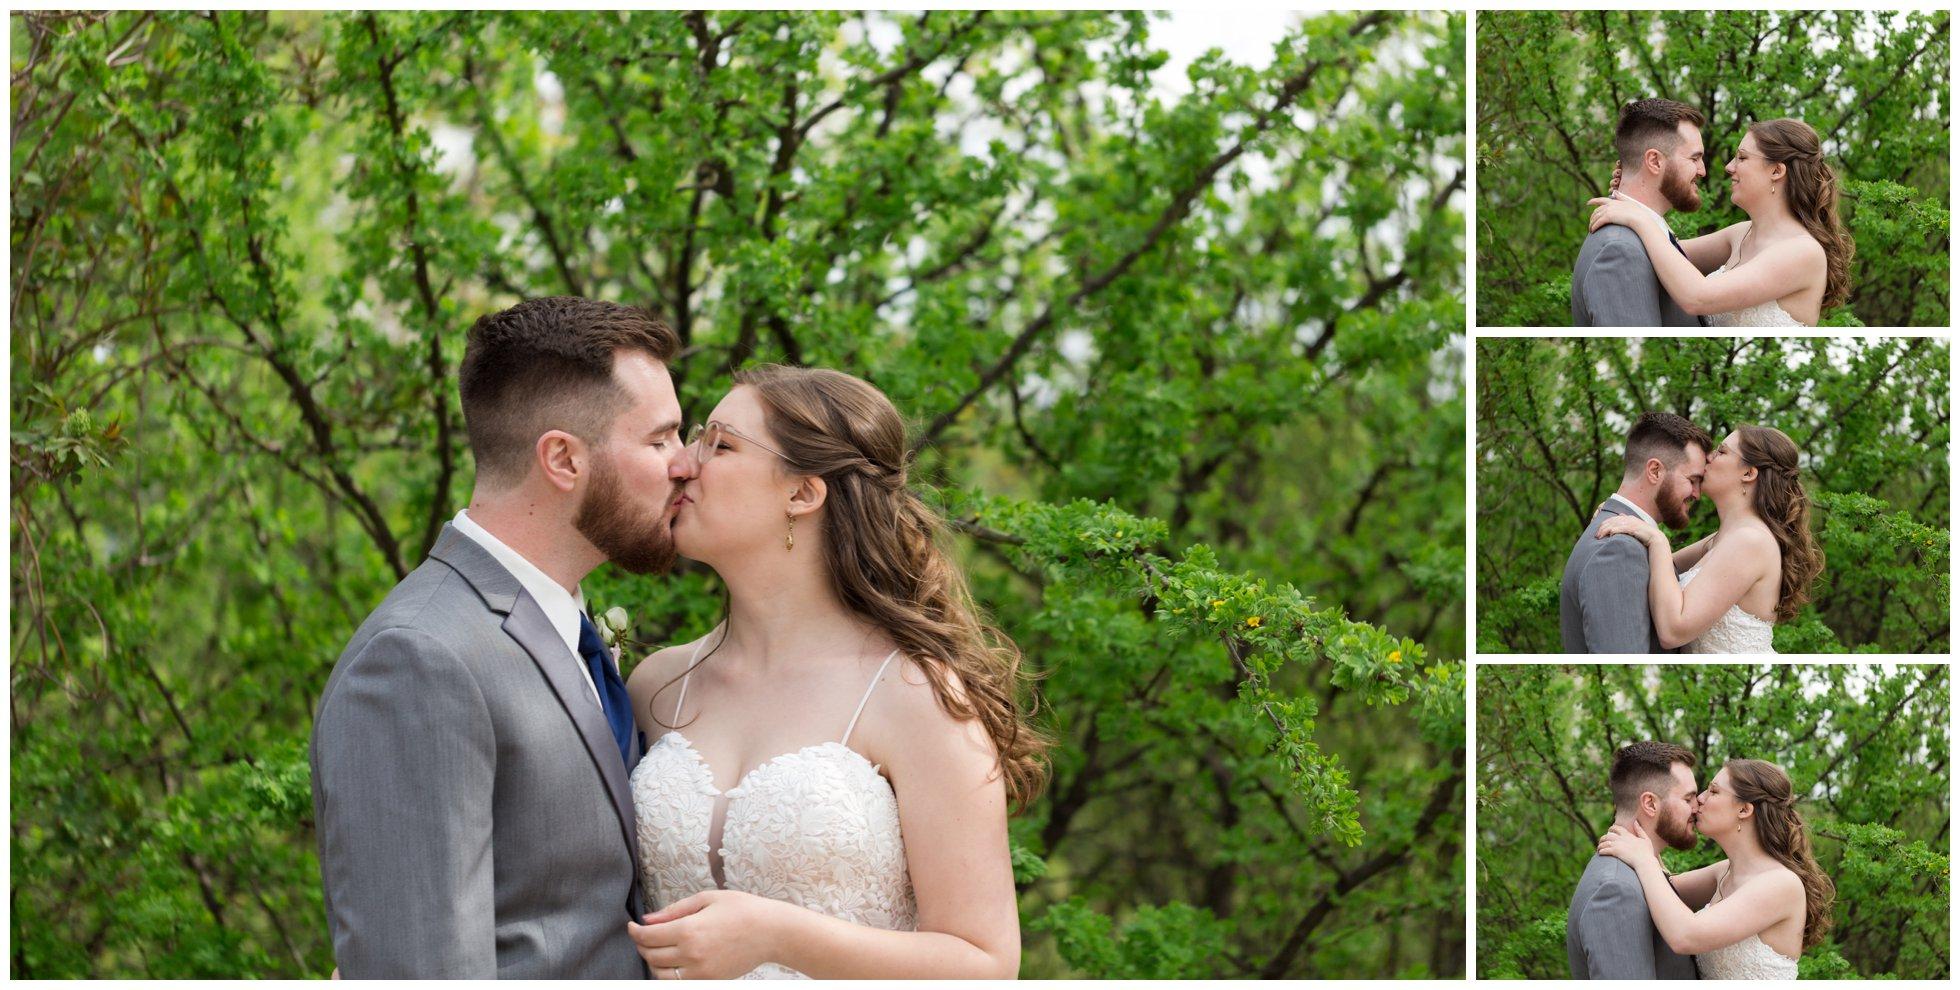 Emily and Royden Edmonton Wedding (Life by Selena Photography)_0037.jpg